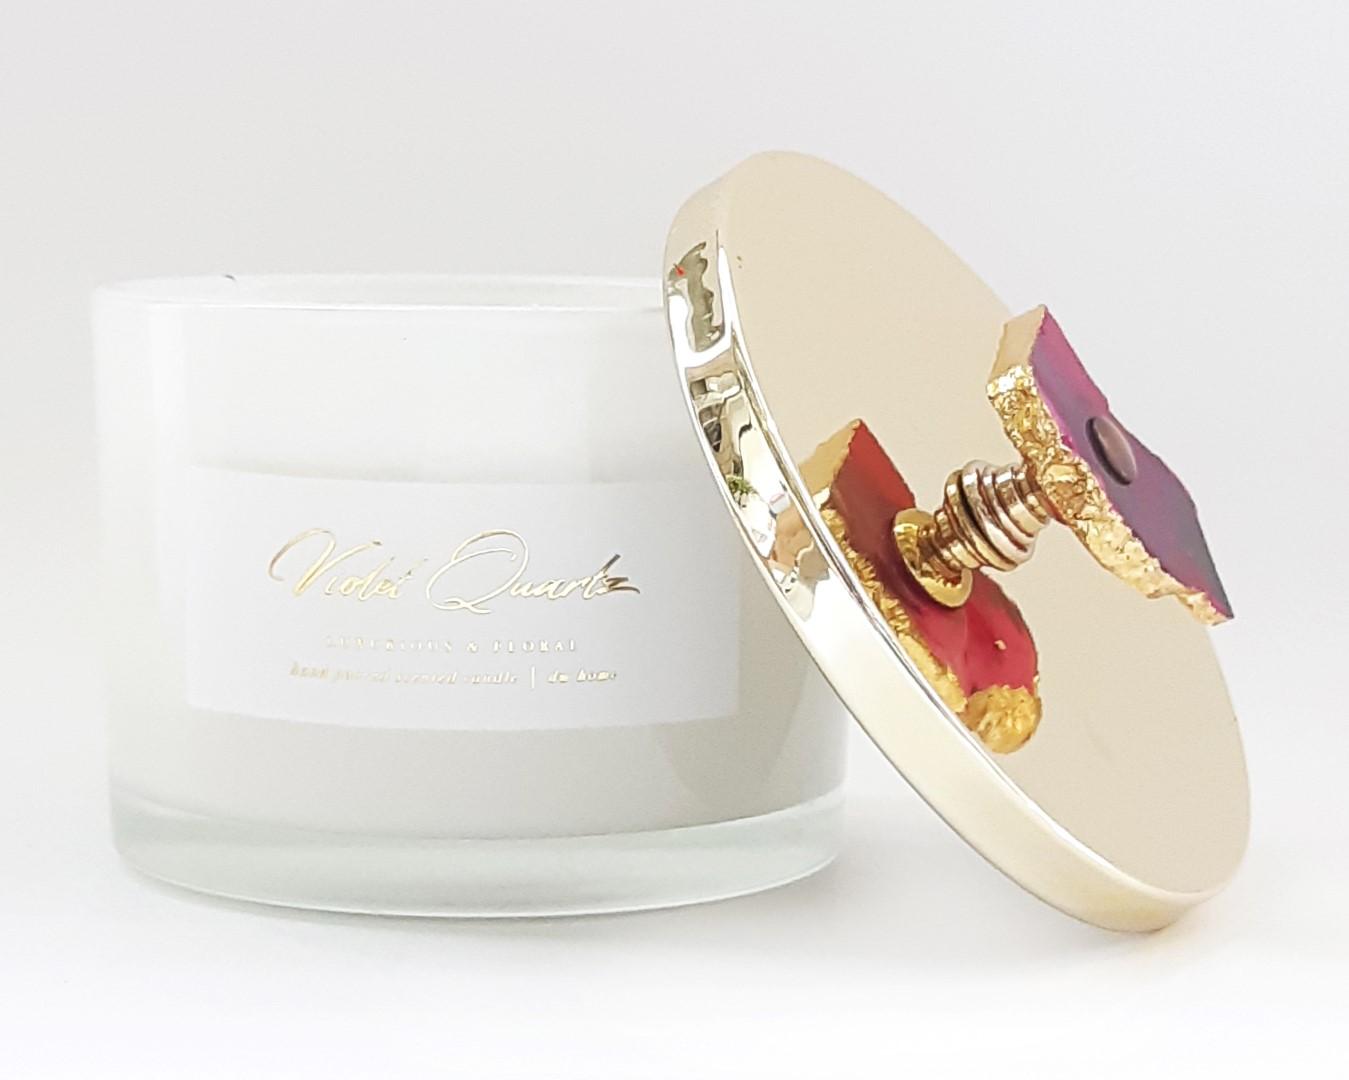 נר בצנצנת עם מכסה זהב וידית אבן - Violet Quartz